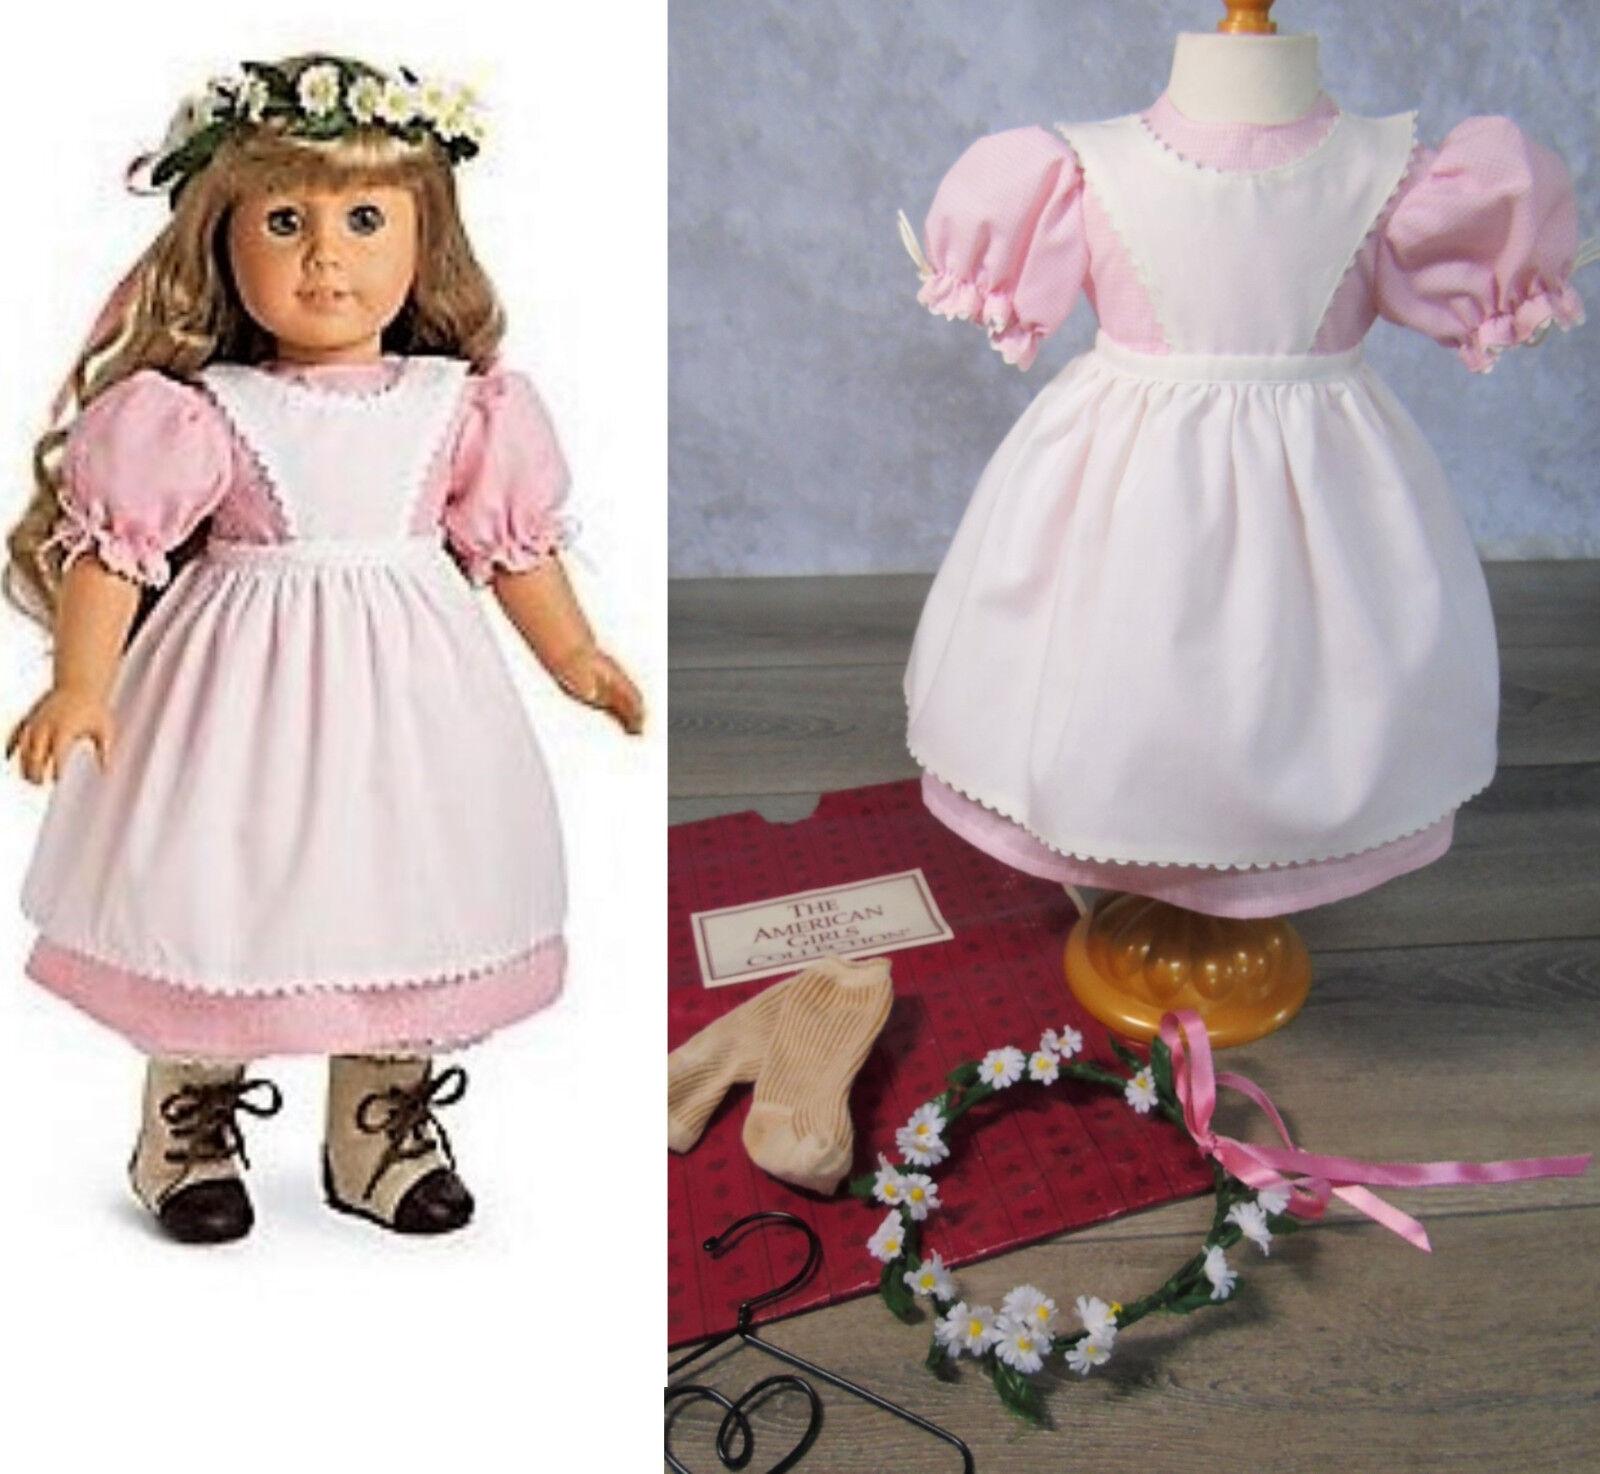 American Girl Pleasant Company Kirsten Geburtstag Outfit Schürze Kleid Kranz Ag